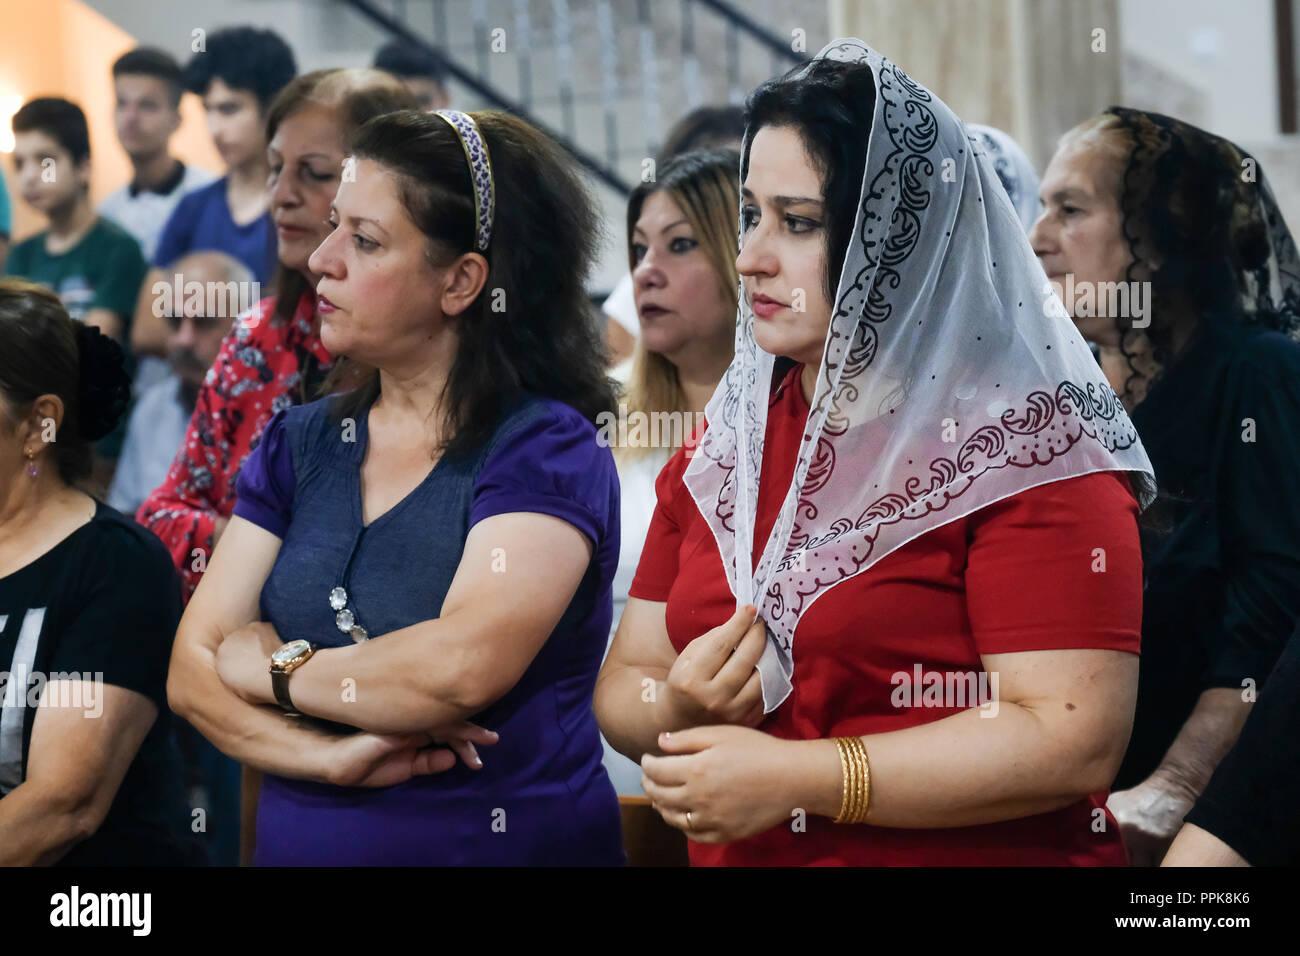 Sunday Mass in a Christian church in Eniskky, Kurdistan region, North Iraq - Sonntagsmesse in der Kirche 'Mart Shmonya and her Son' in Enishkye im Nord-Irak, Kurdistan - Stock Image